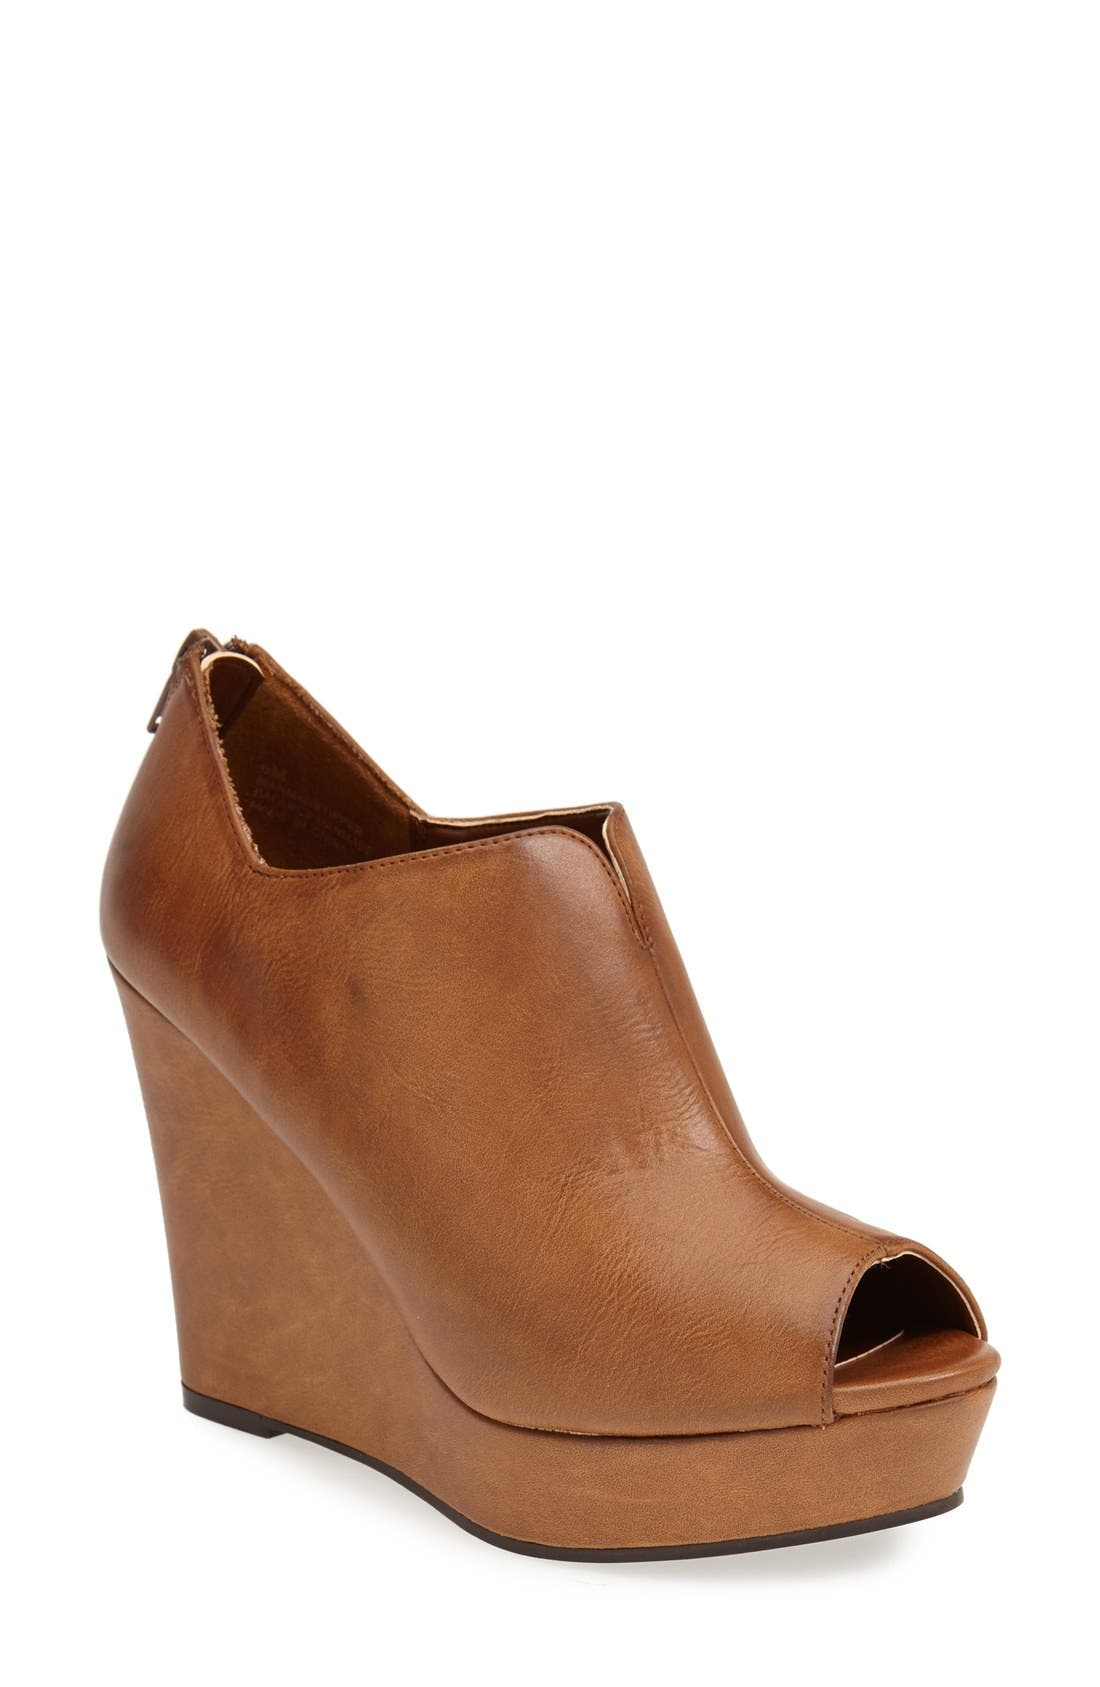 'Run Around' Wedge Sandal,                         Main,                         color, Cognac